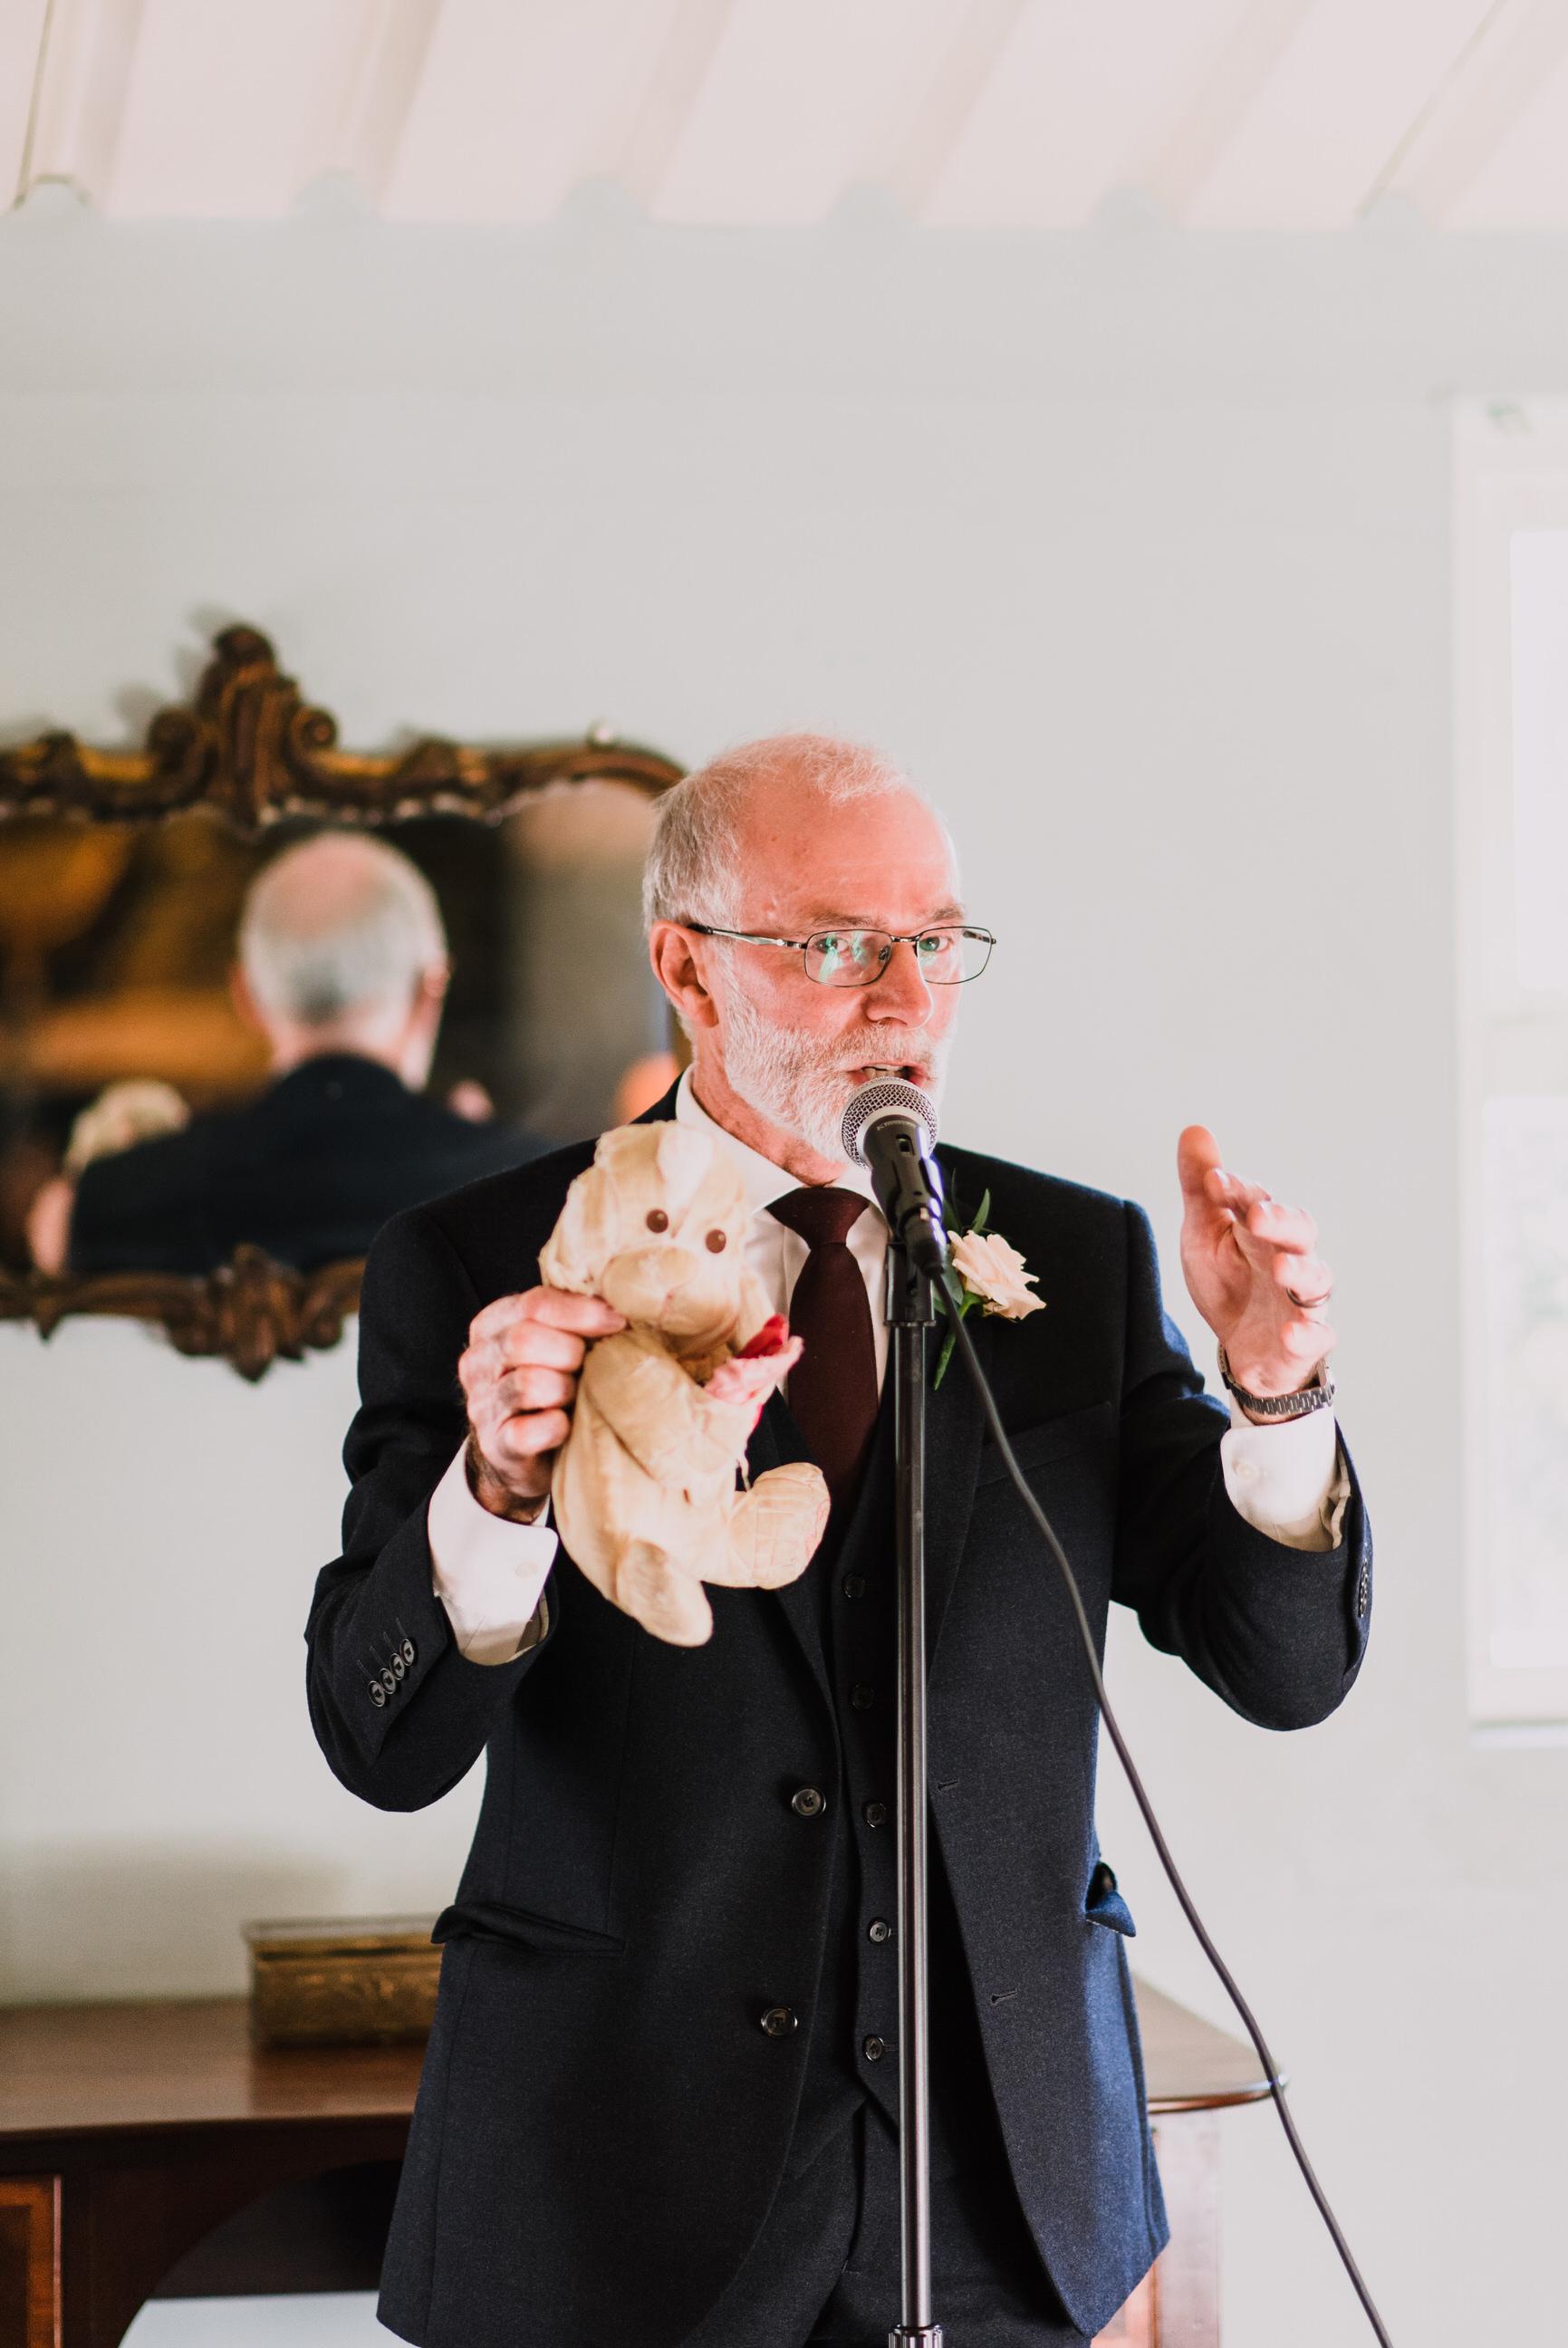 lissanoure castle wedding, northern ireland wedding photographer, romantic northern irish wedding venue, castle wedding ireland, natural wedding photography ni (109).jpg